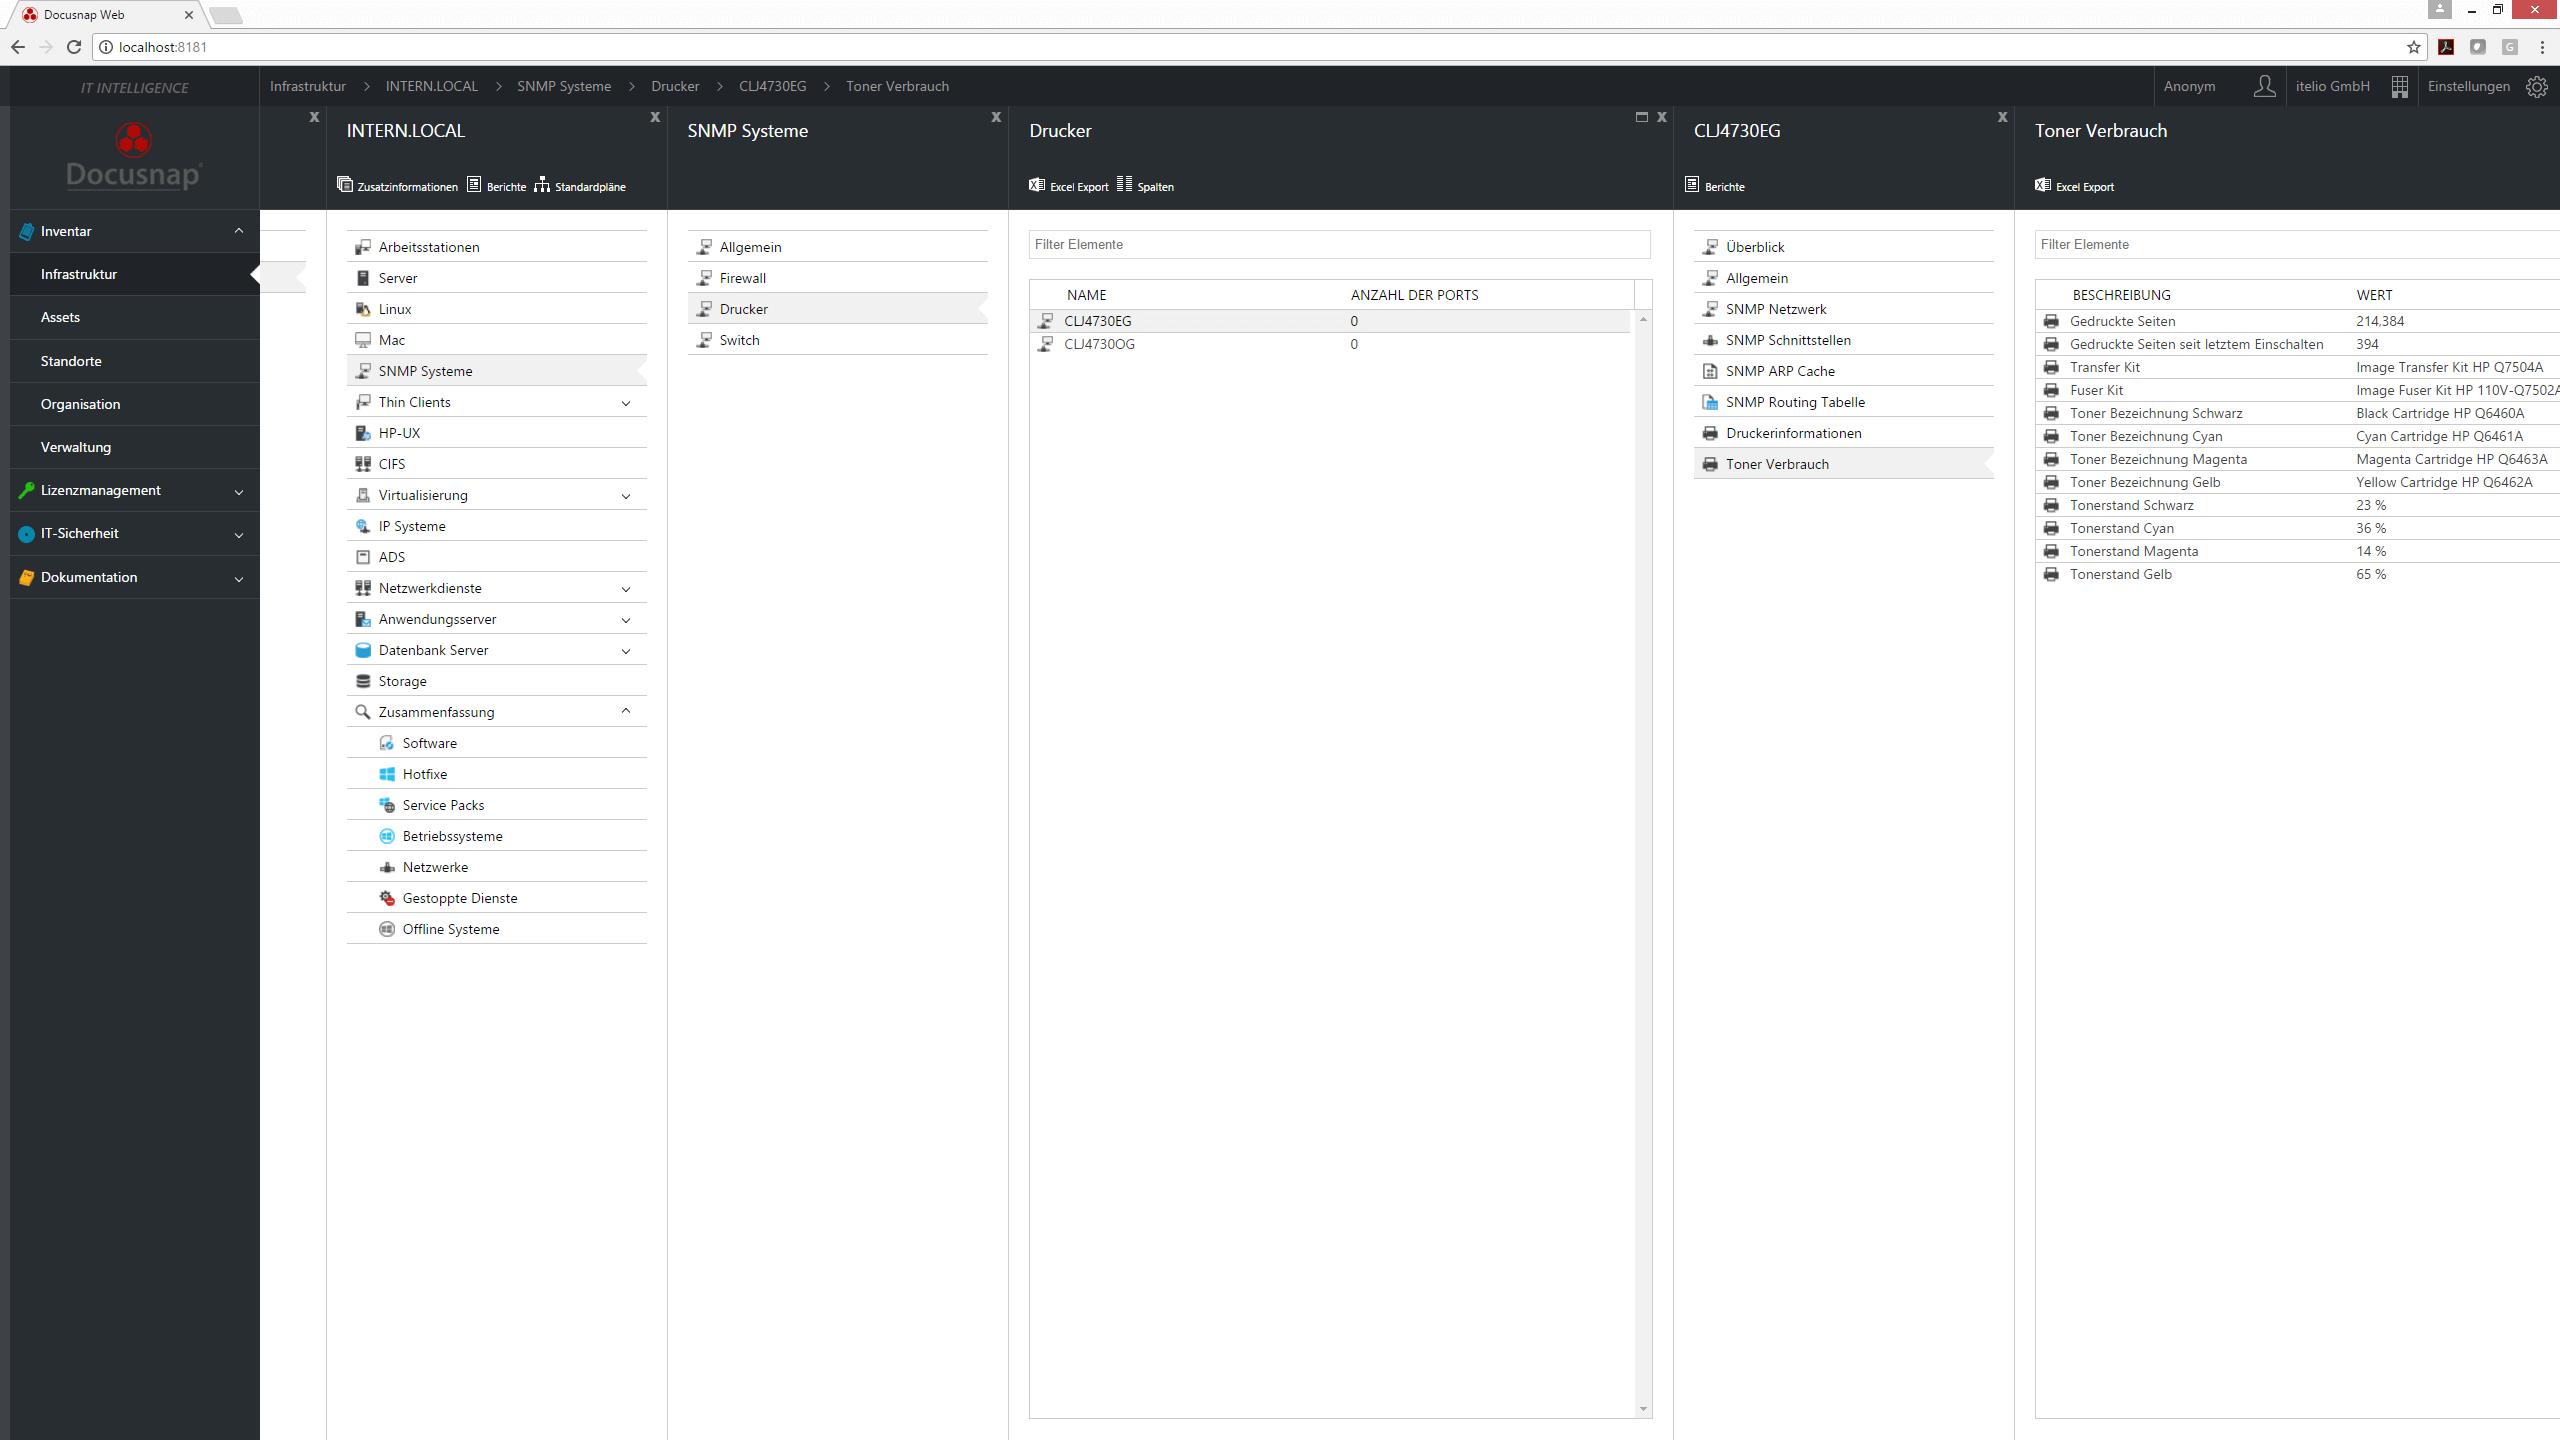 Screenshot: Ansicht des Toner Verbrauchs im Docusnap Webclient